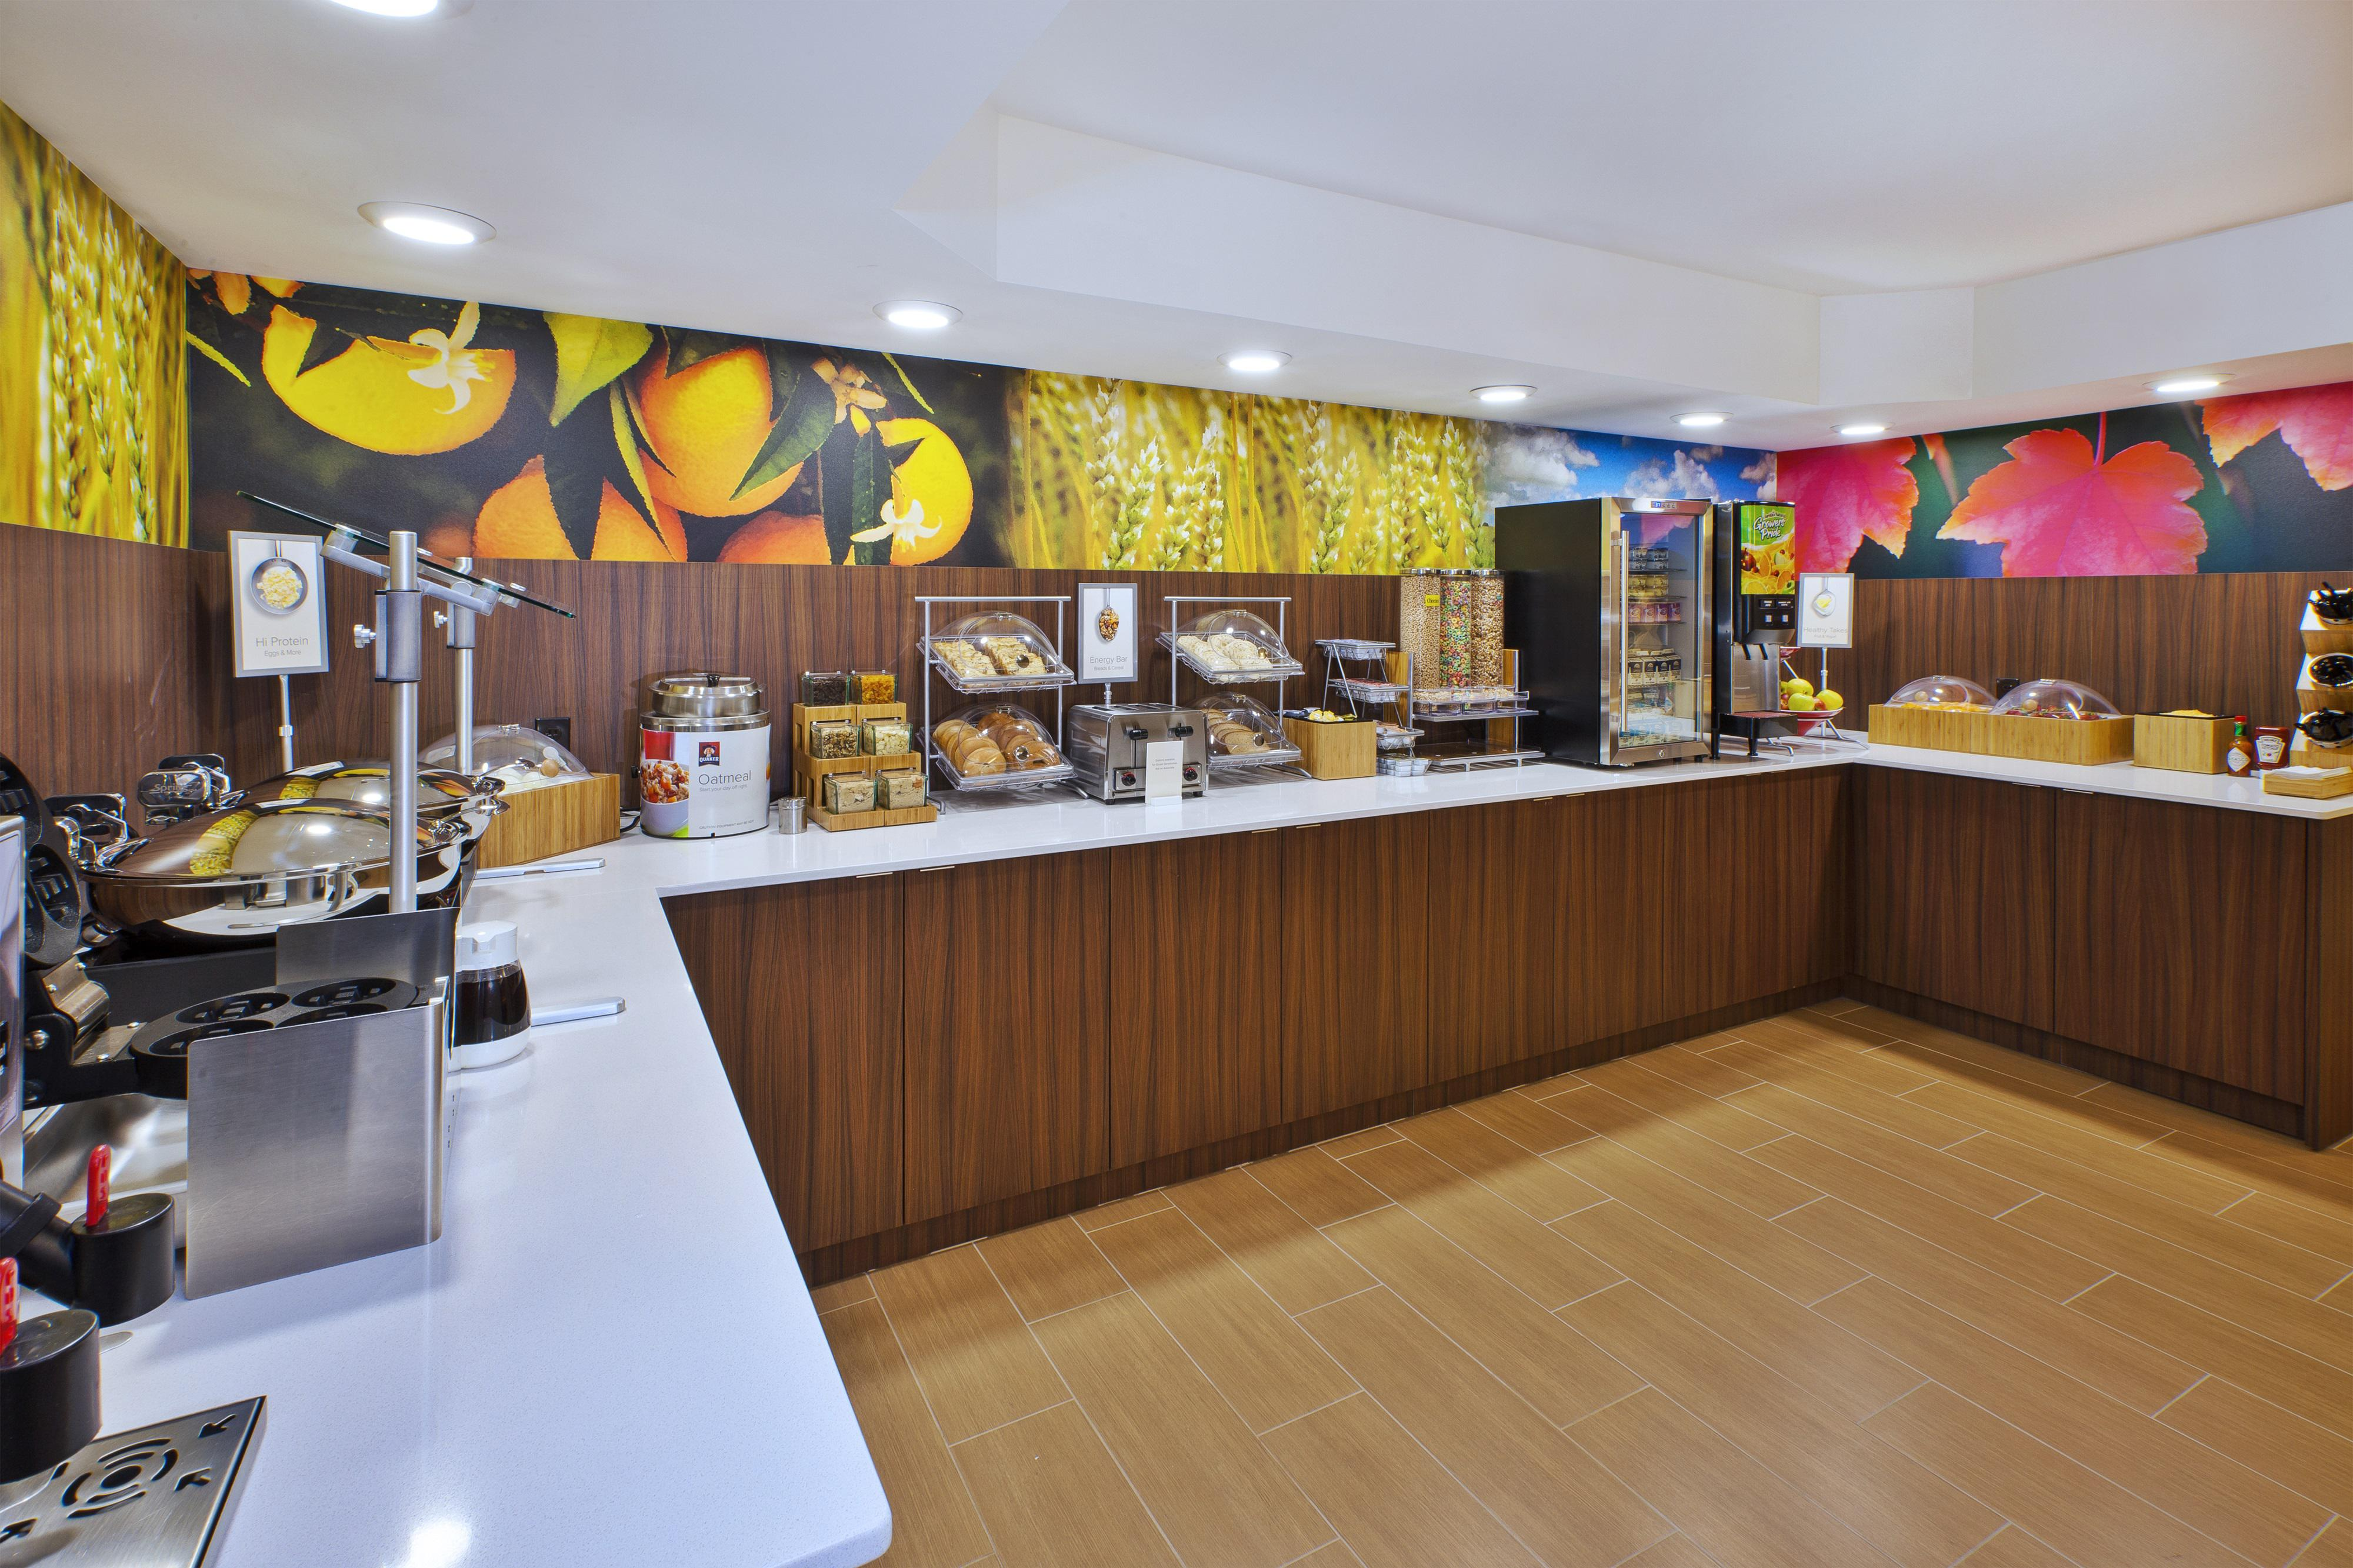 Fairfield Inn & Suites by Marriott Dulles Airport Herndon/Reston image 5